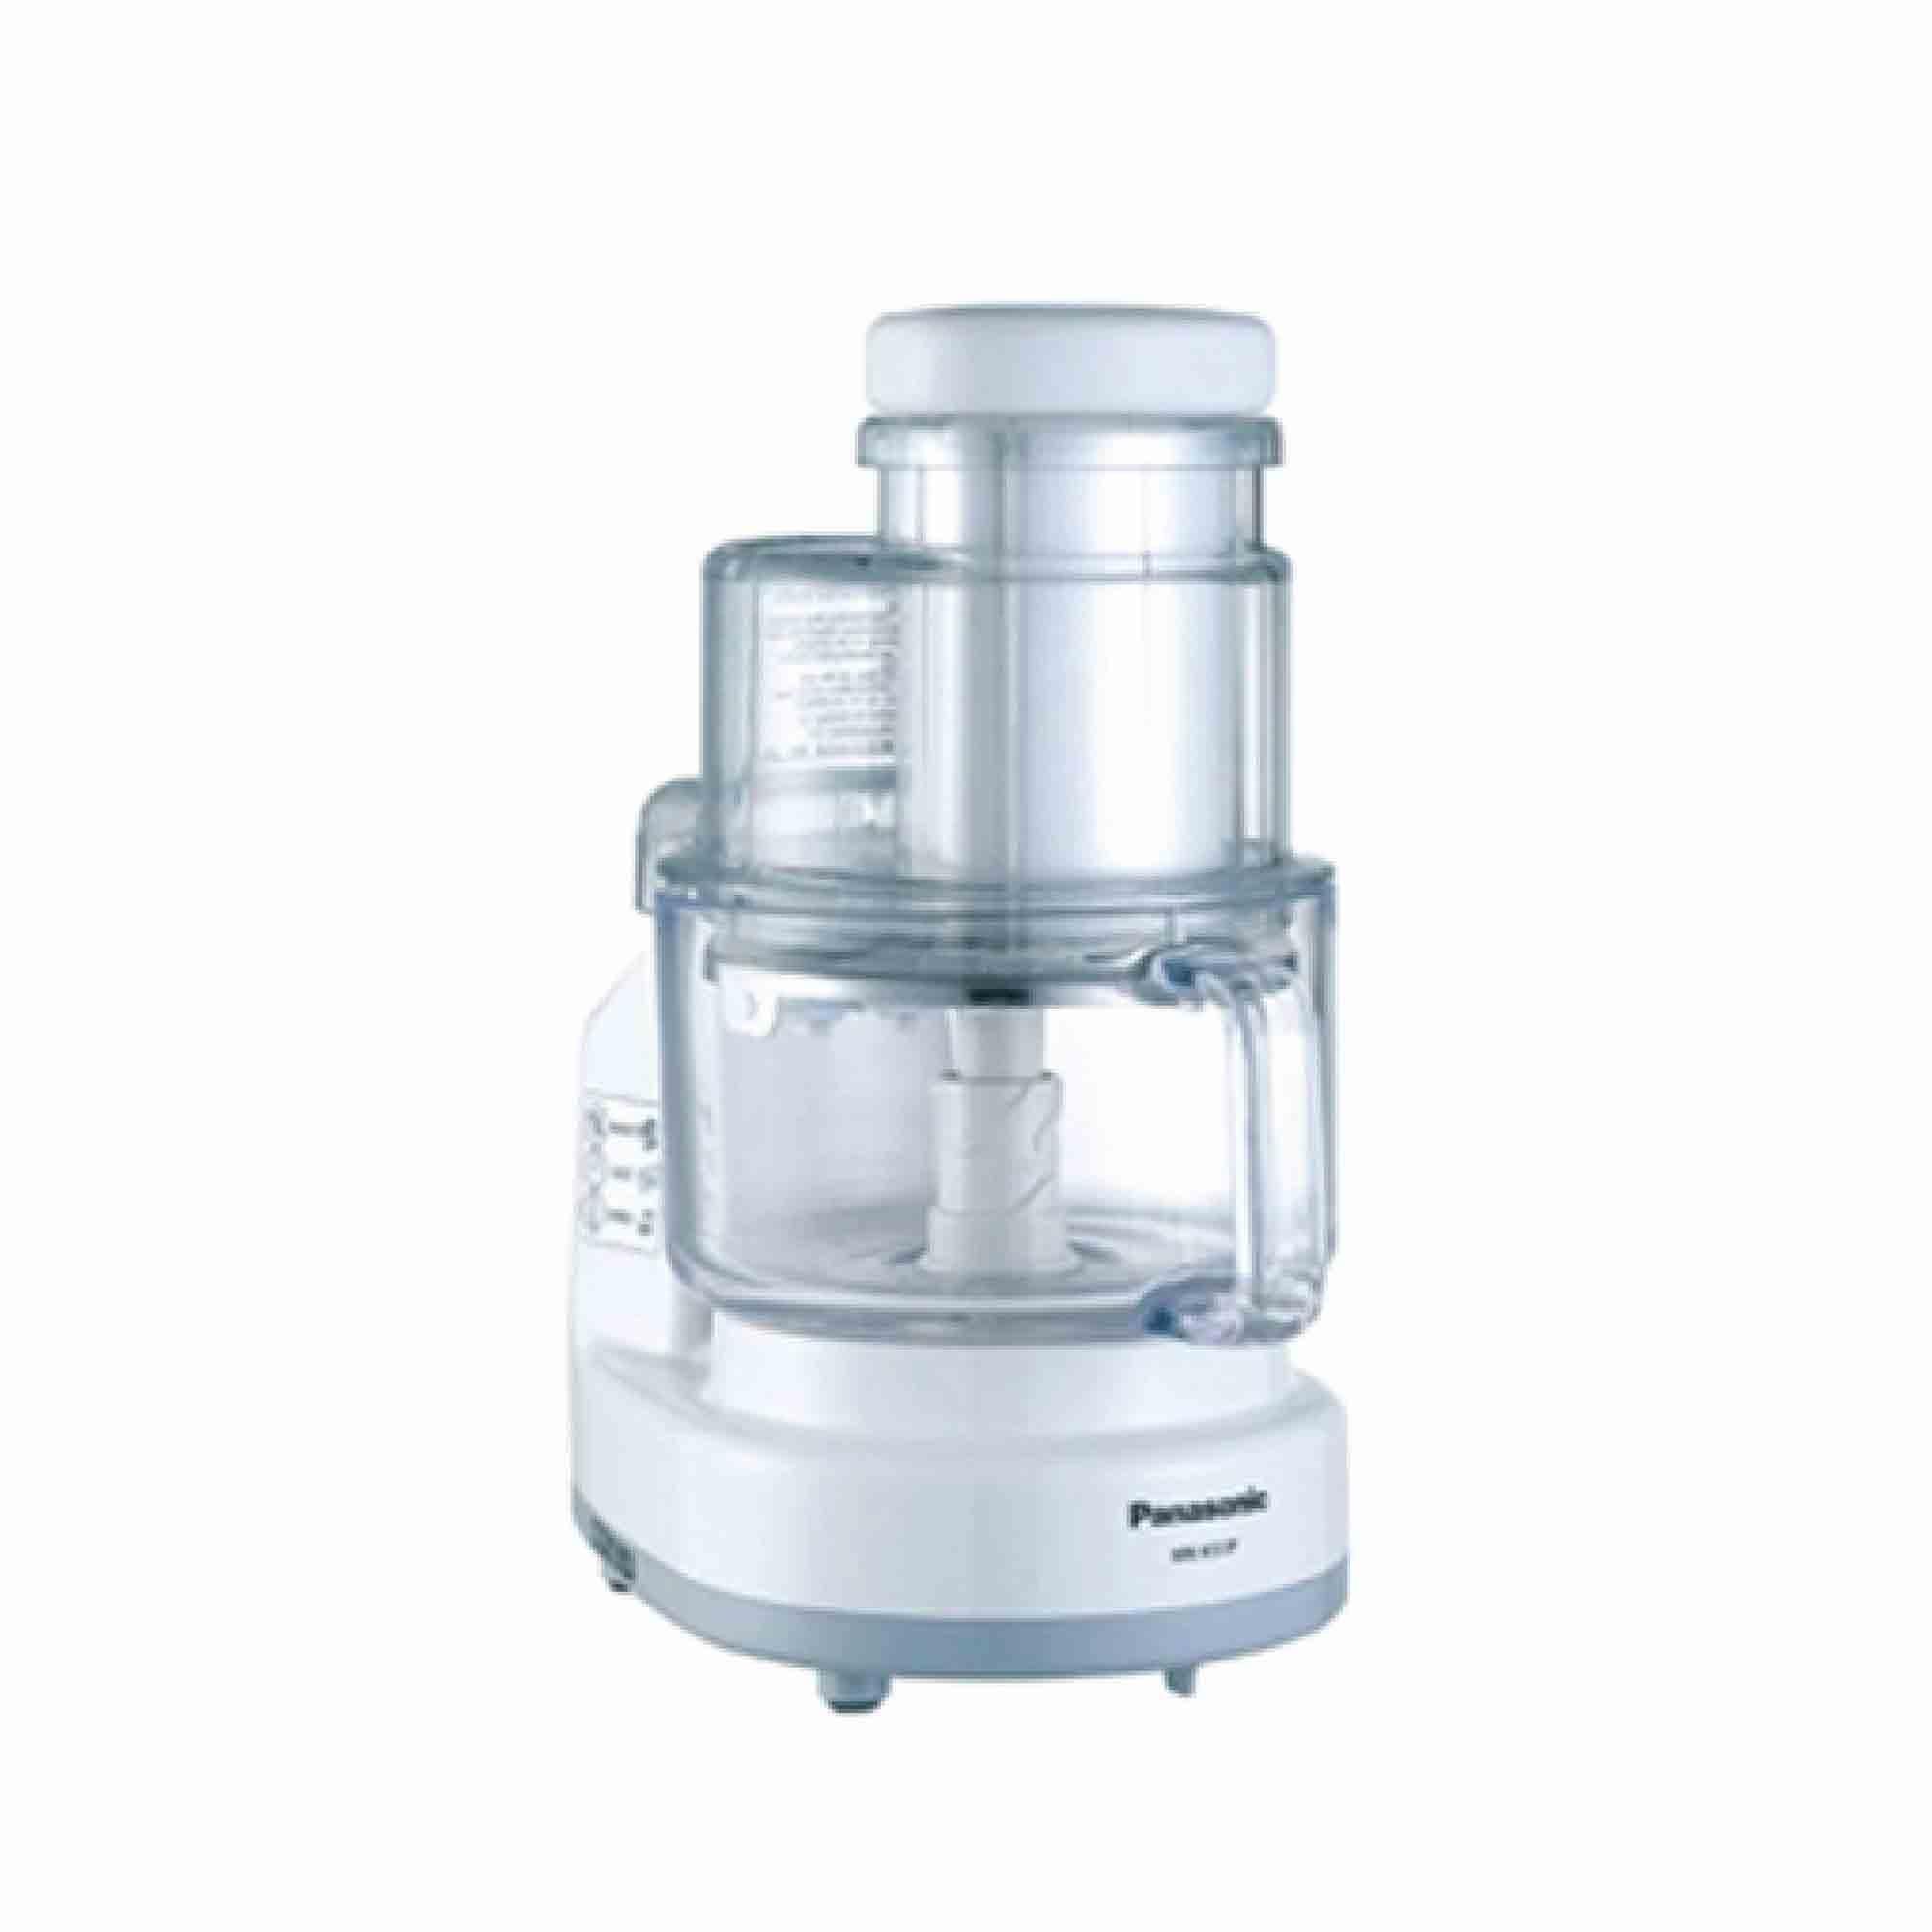 Panasonic Food Processor MK-K51P (300 (end 5/2/2020 6:01 PM)